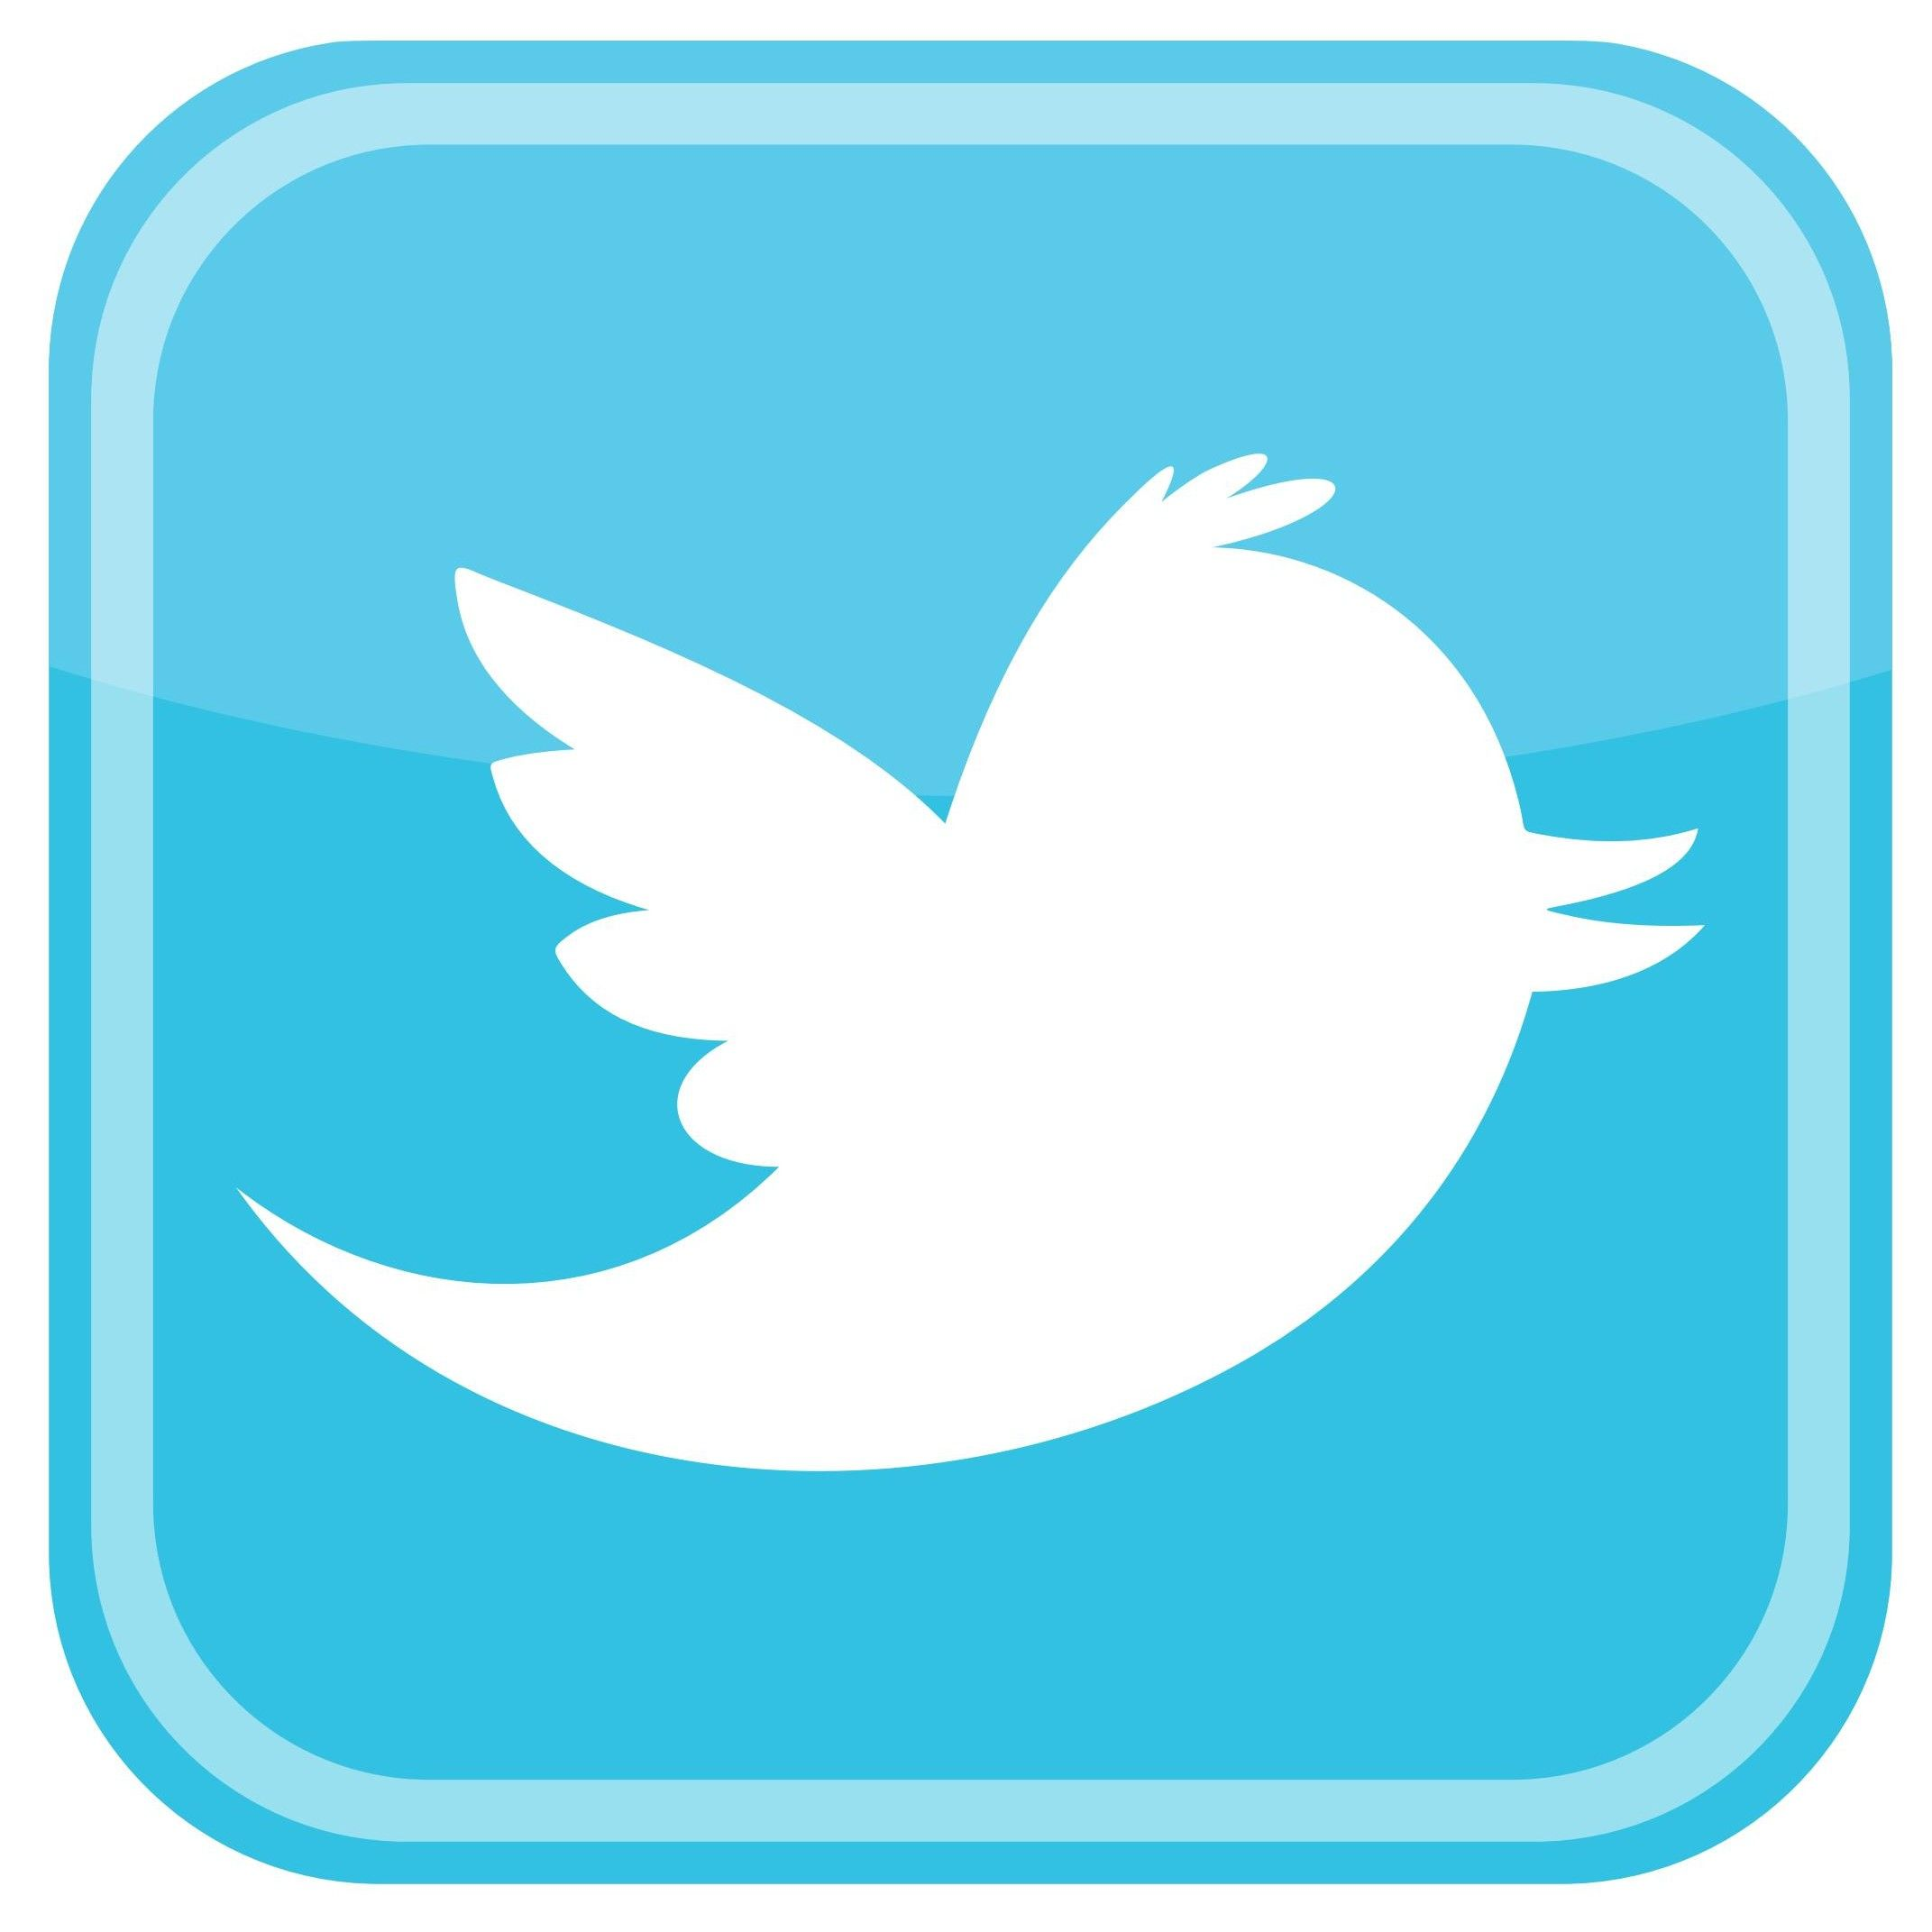 Twitter Bird Icon Logo Vector [EPS File]